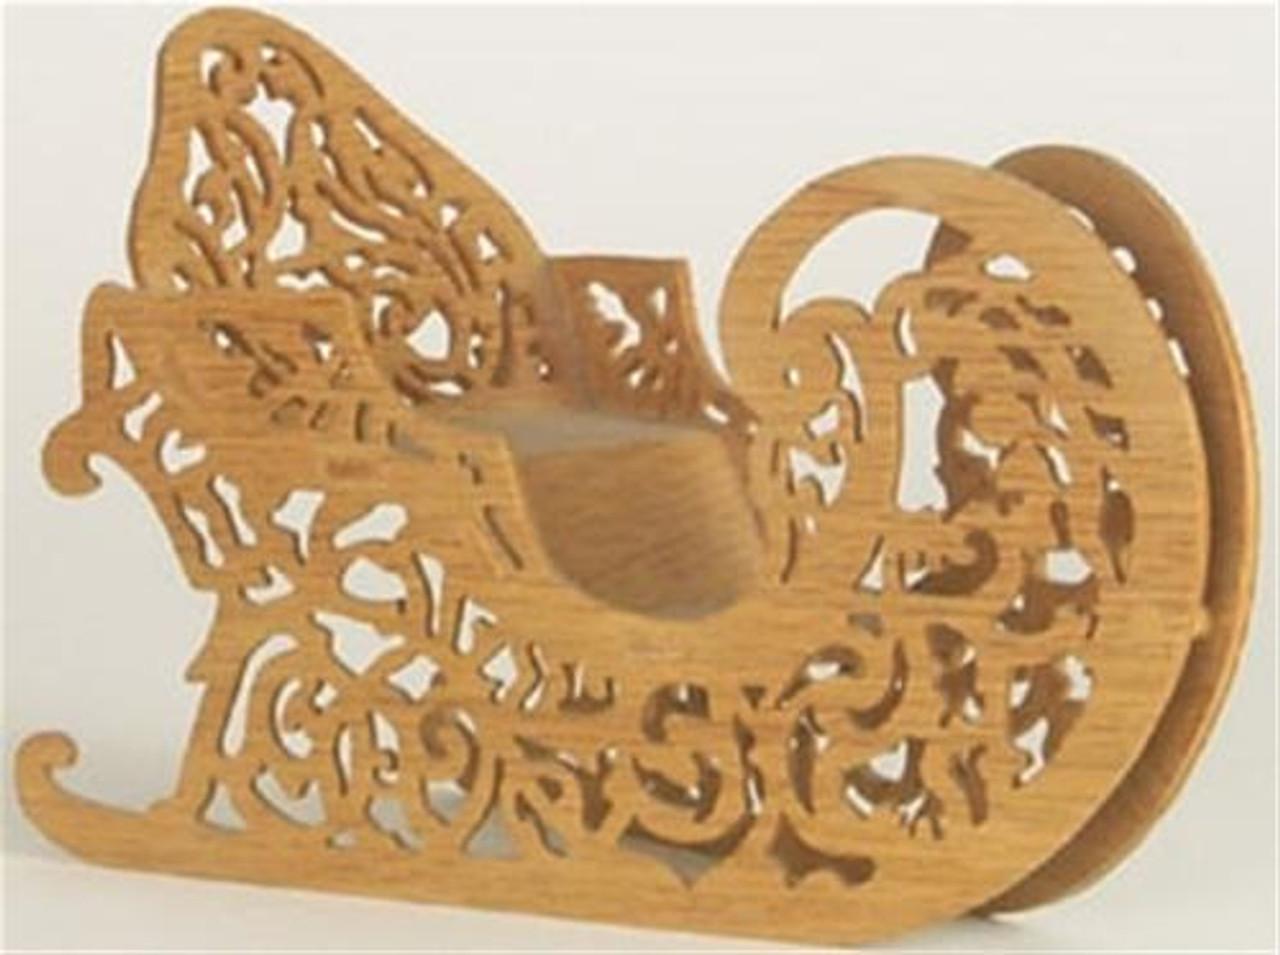 Wildwood Designs Santas Sleigh Scroll Saw Plan